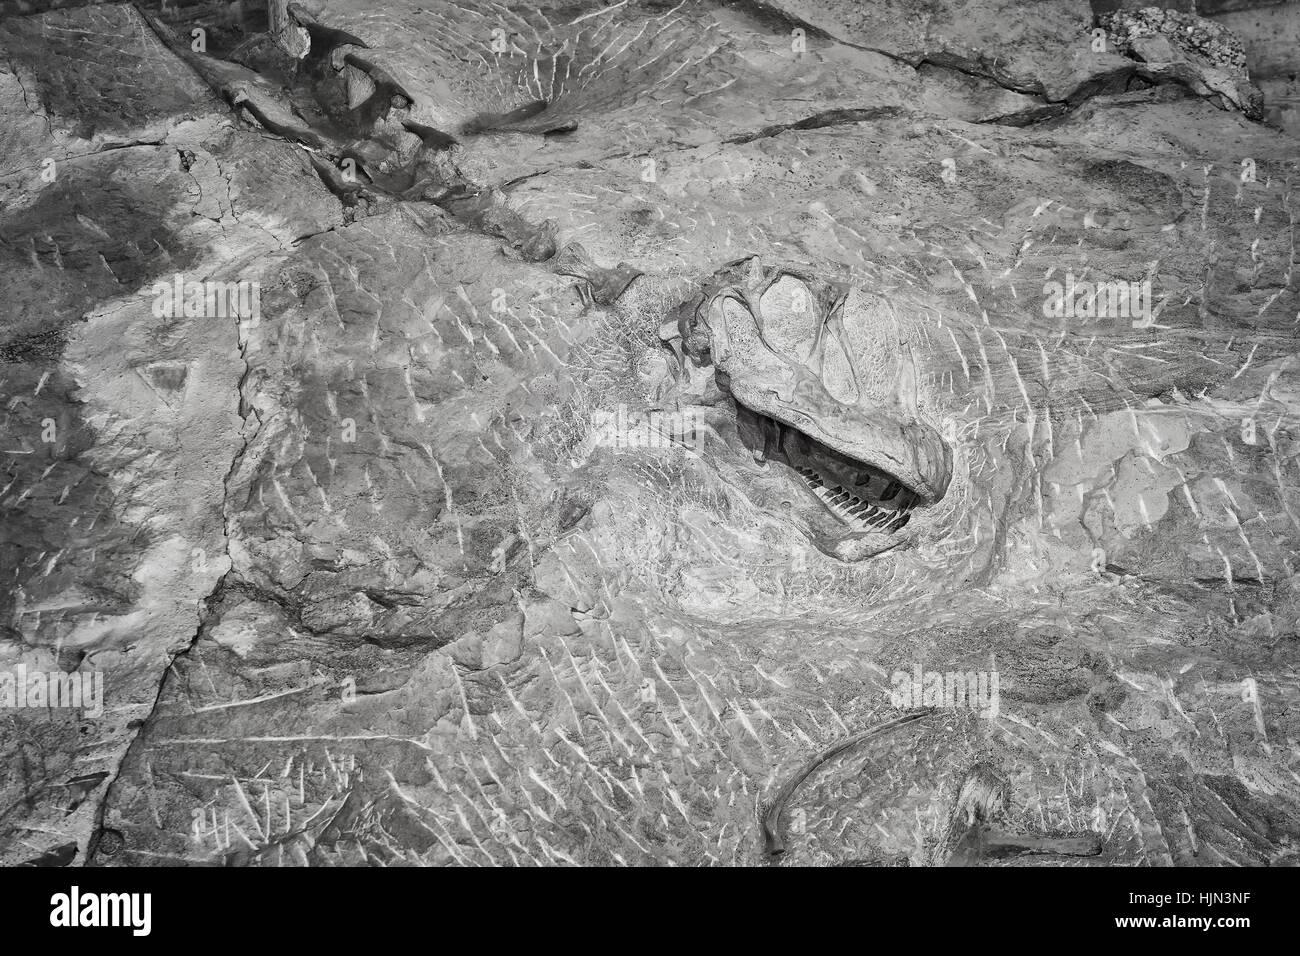 Black and white picture of a dinosaur skeleton, Dinosaur National Monument, Utah, USA. - Stock Image